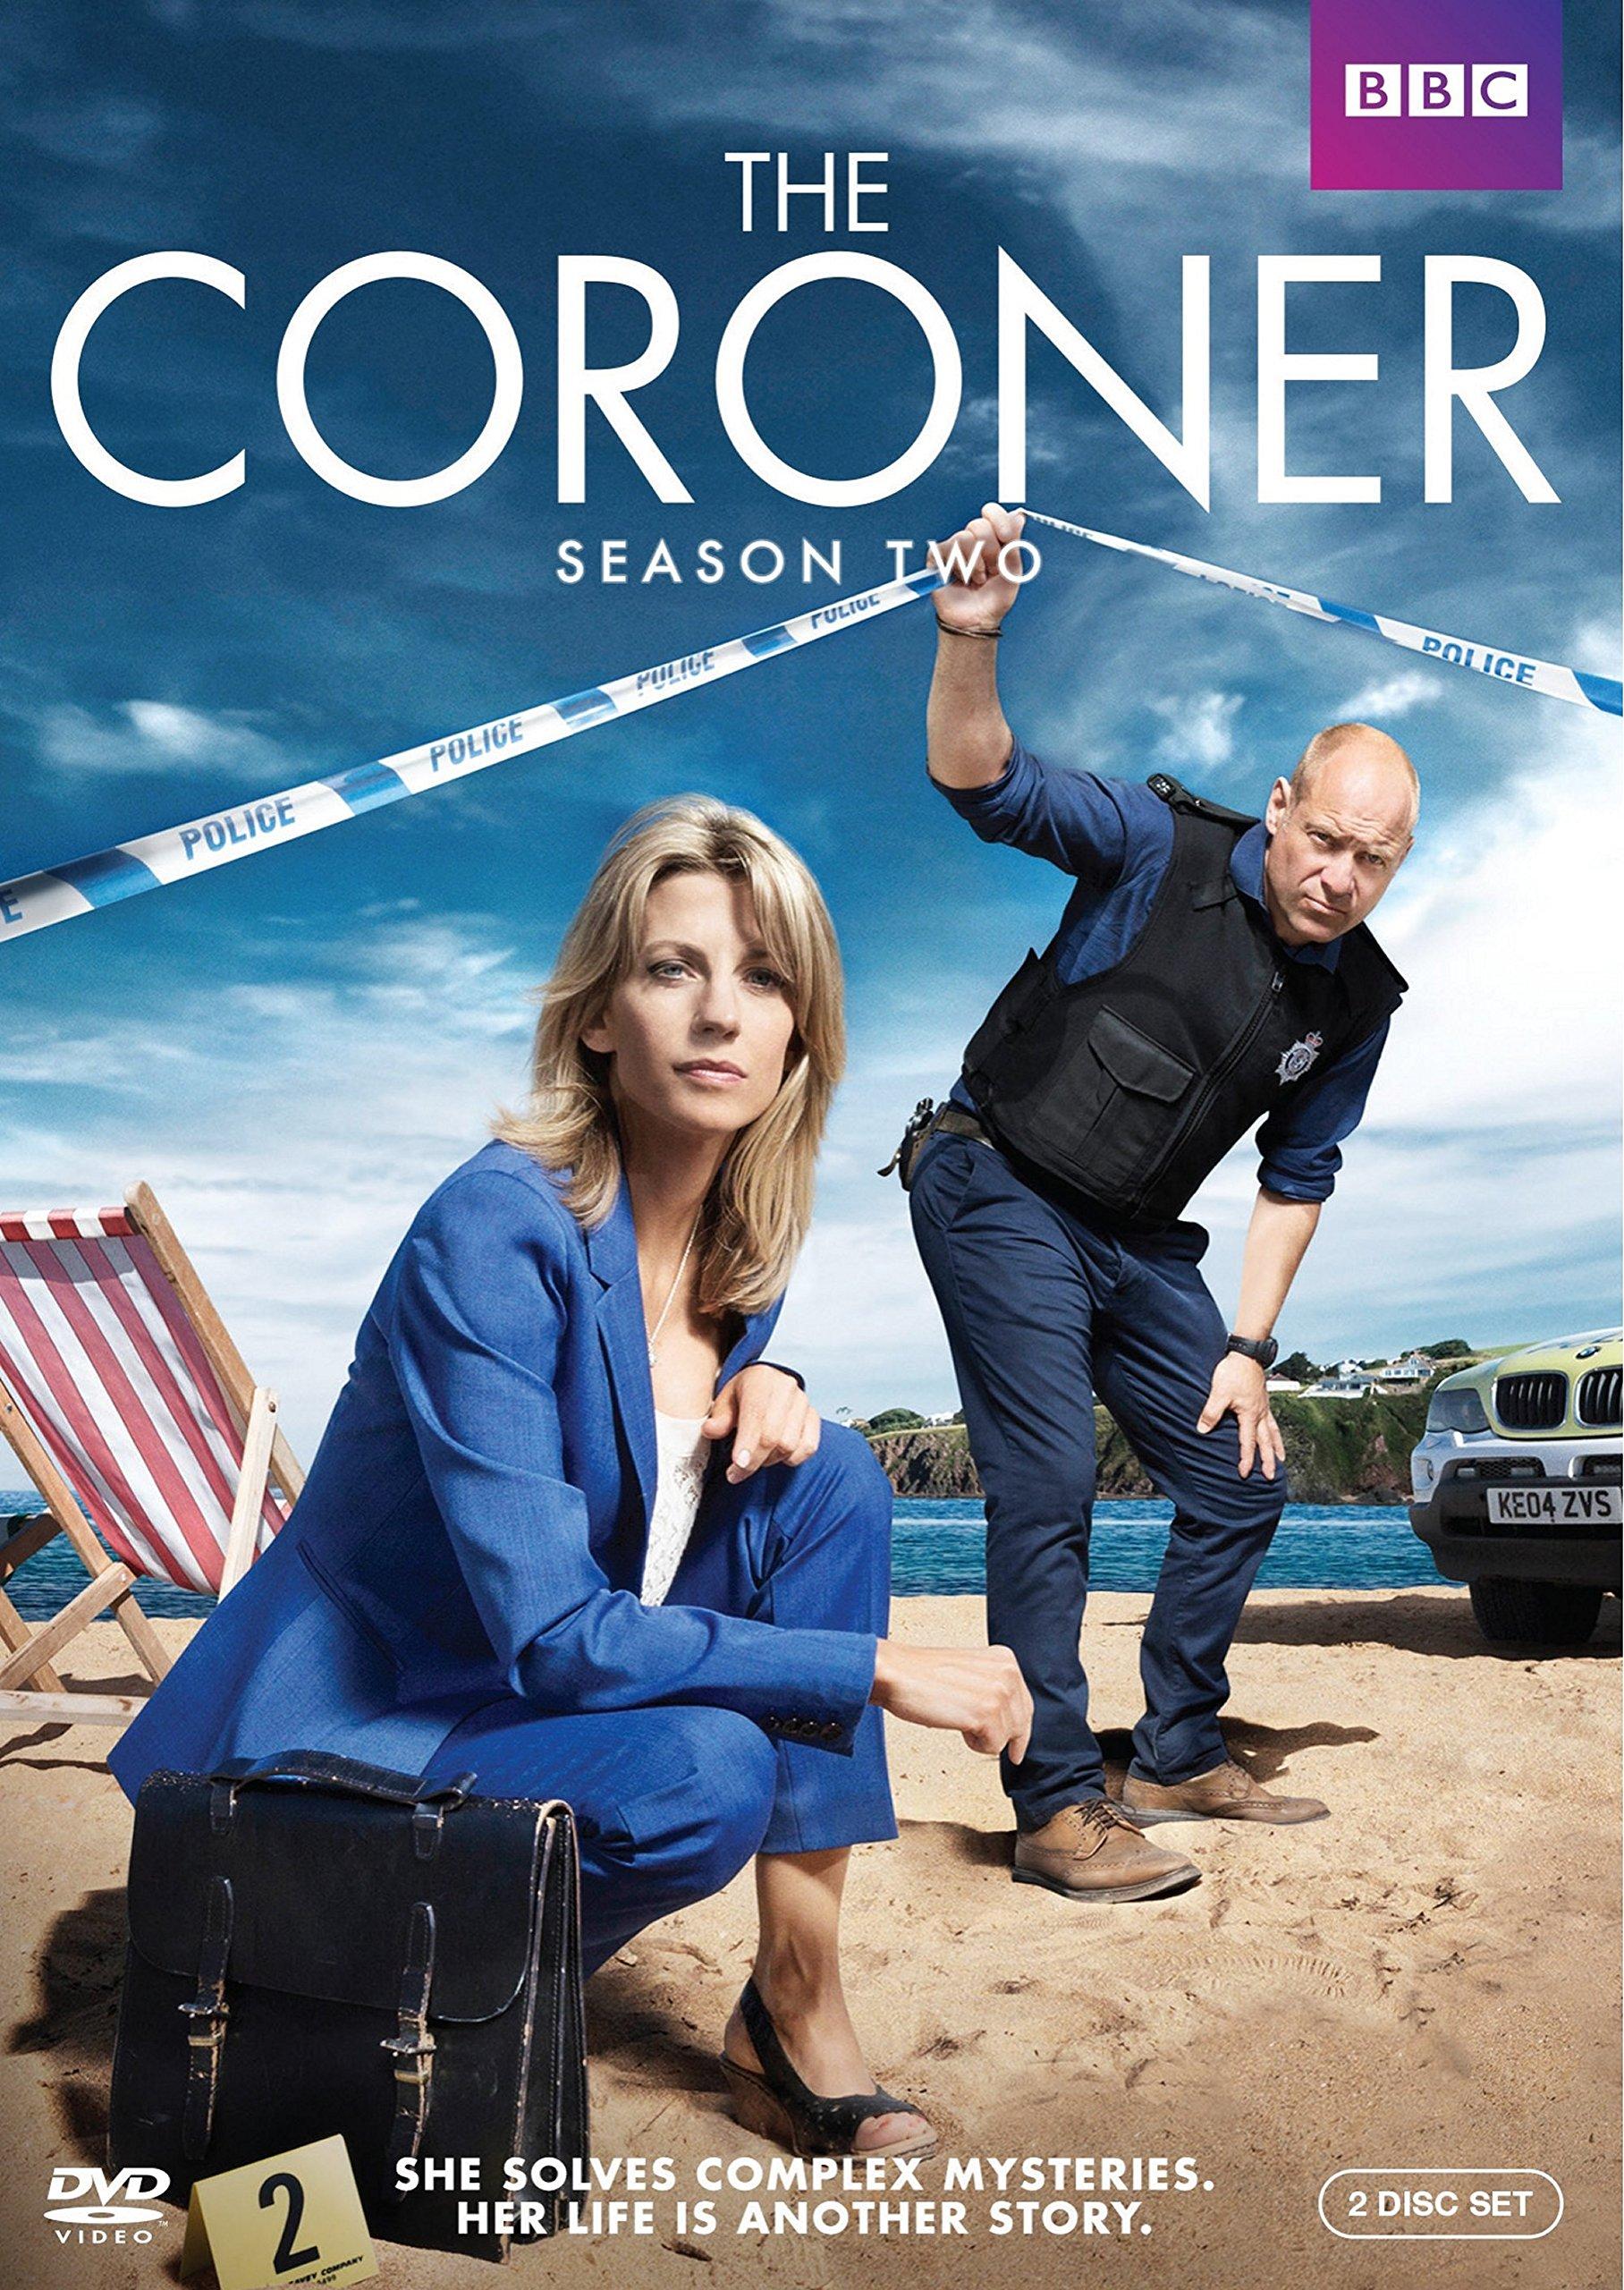 The Coroner, Season 2